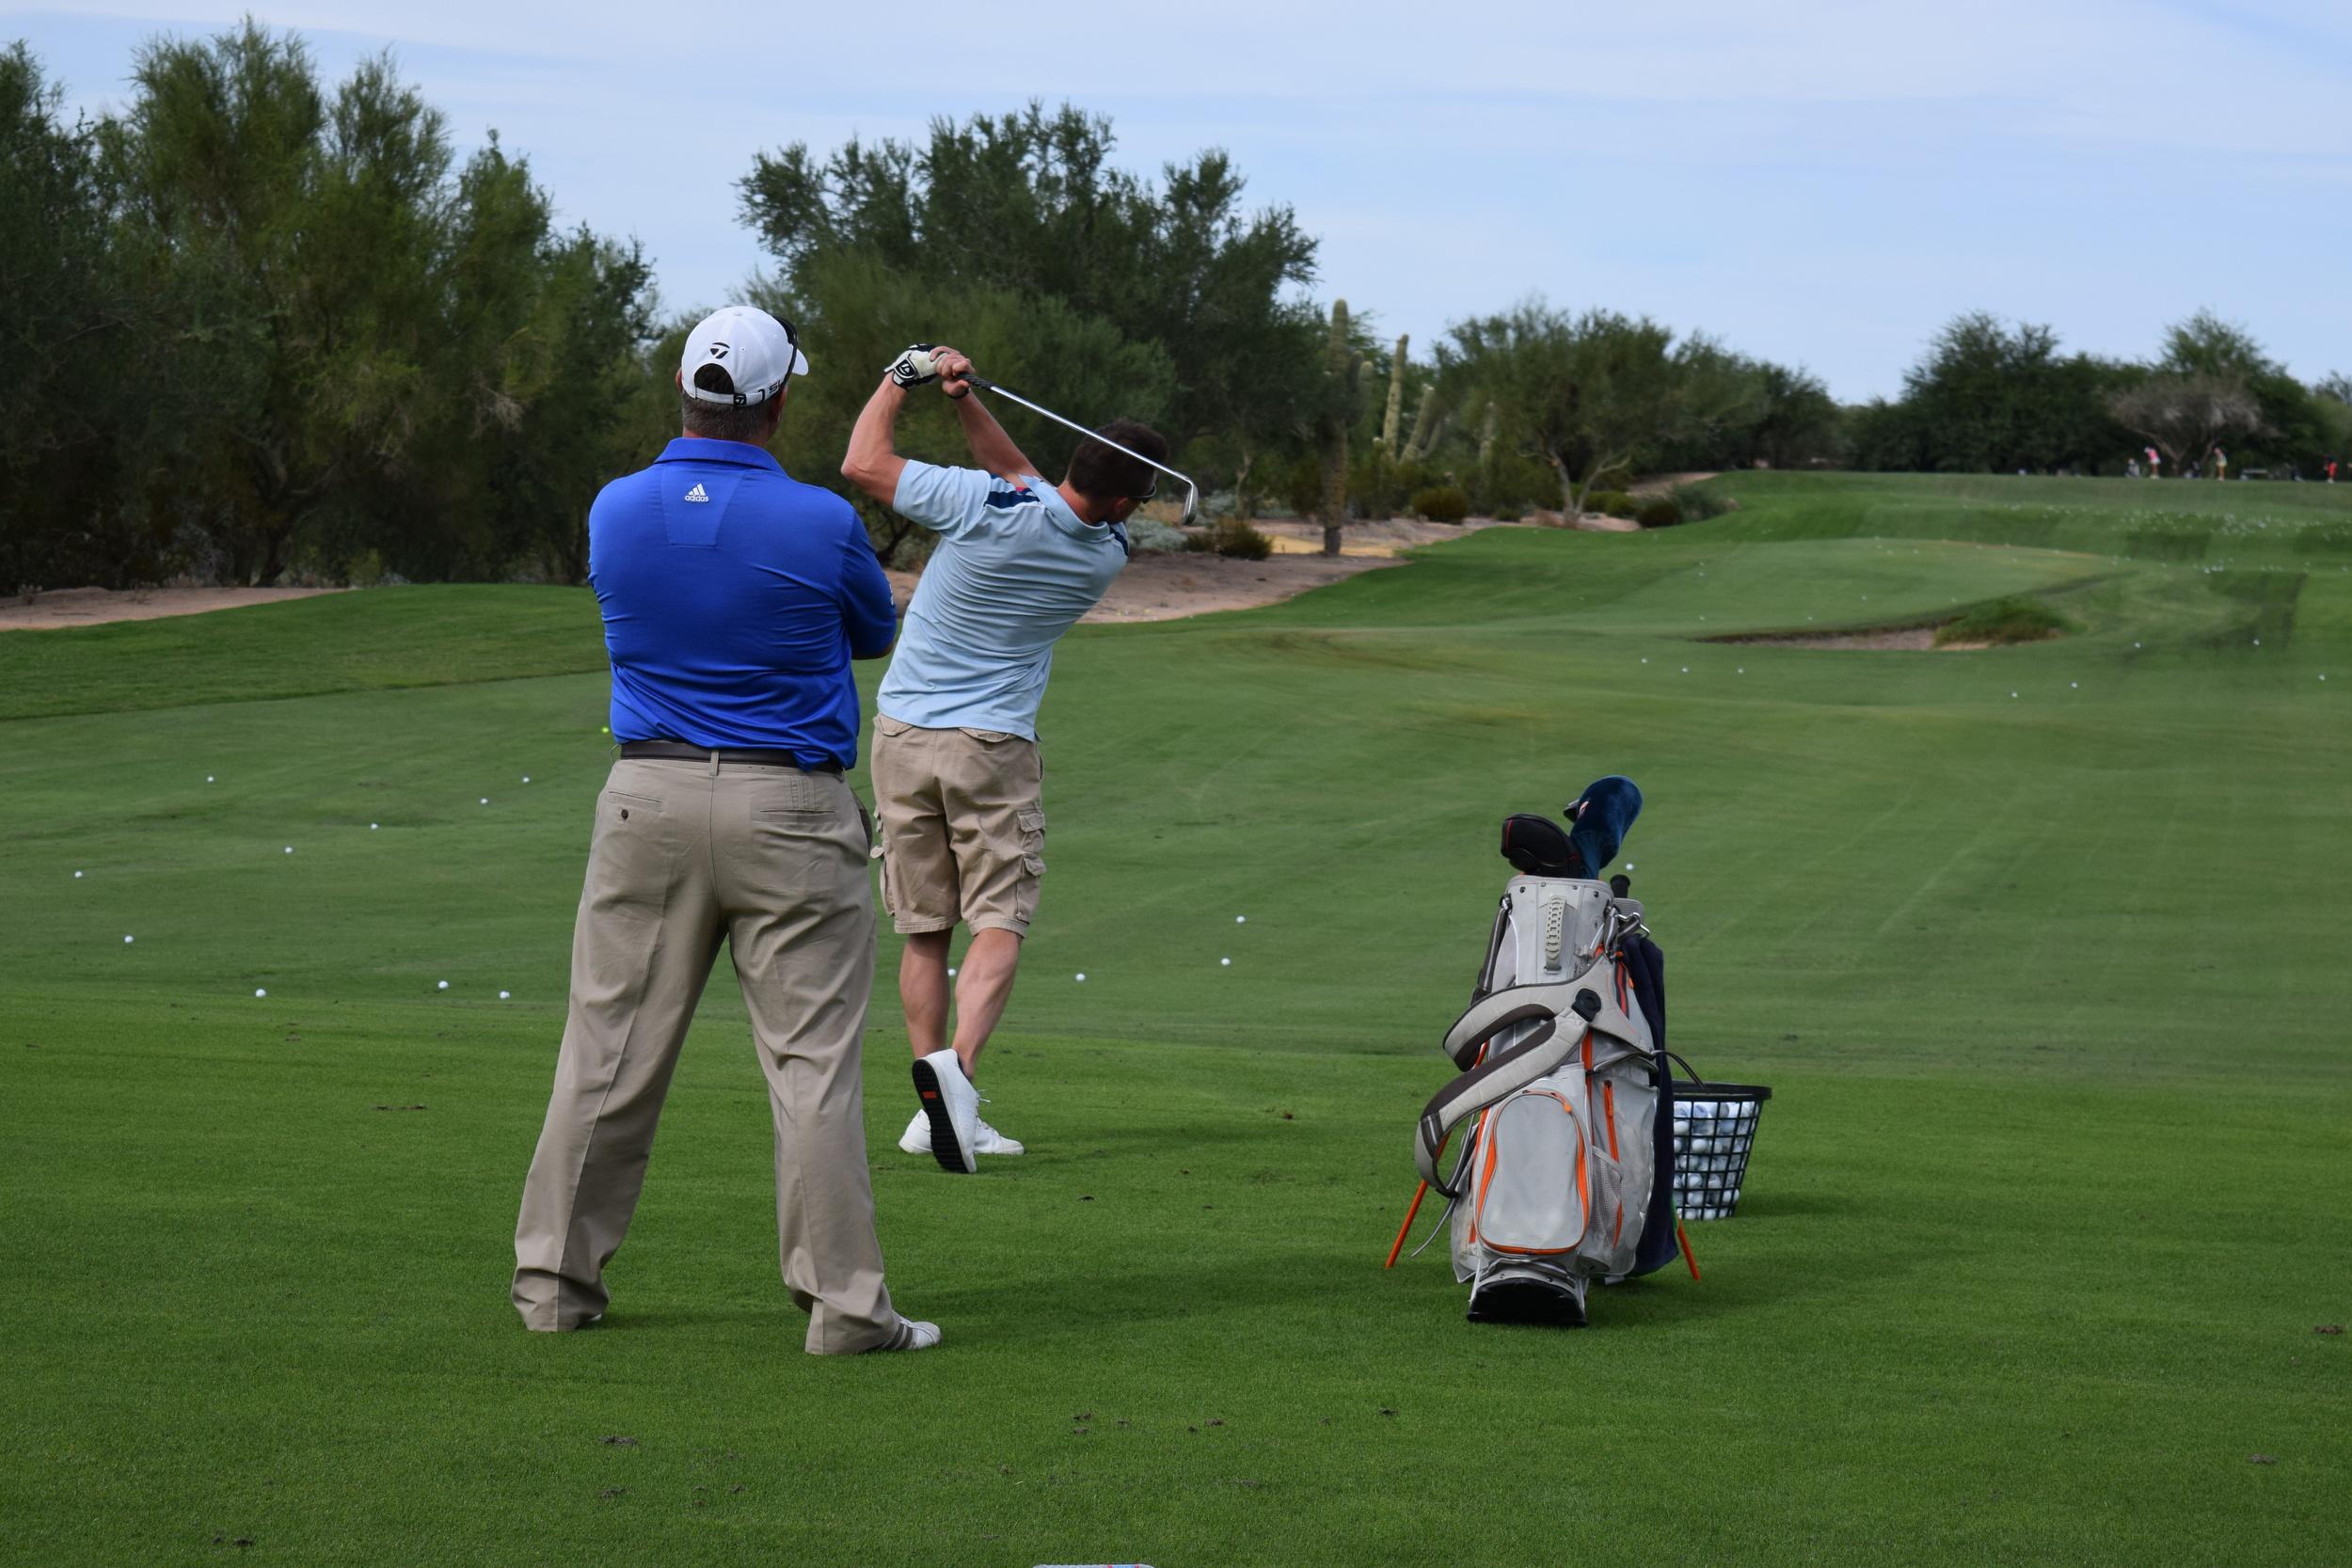 Jeff Yurkiewicz helps instruct a student during a half day golf school at Grayhawk Golf Club in Scottsdale, AZ.